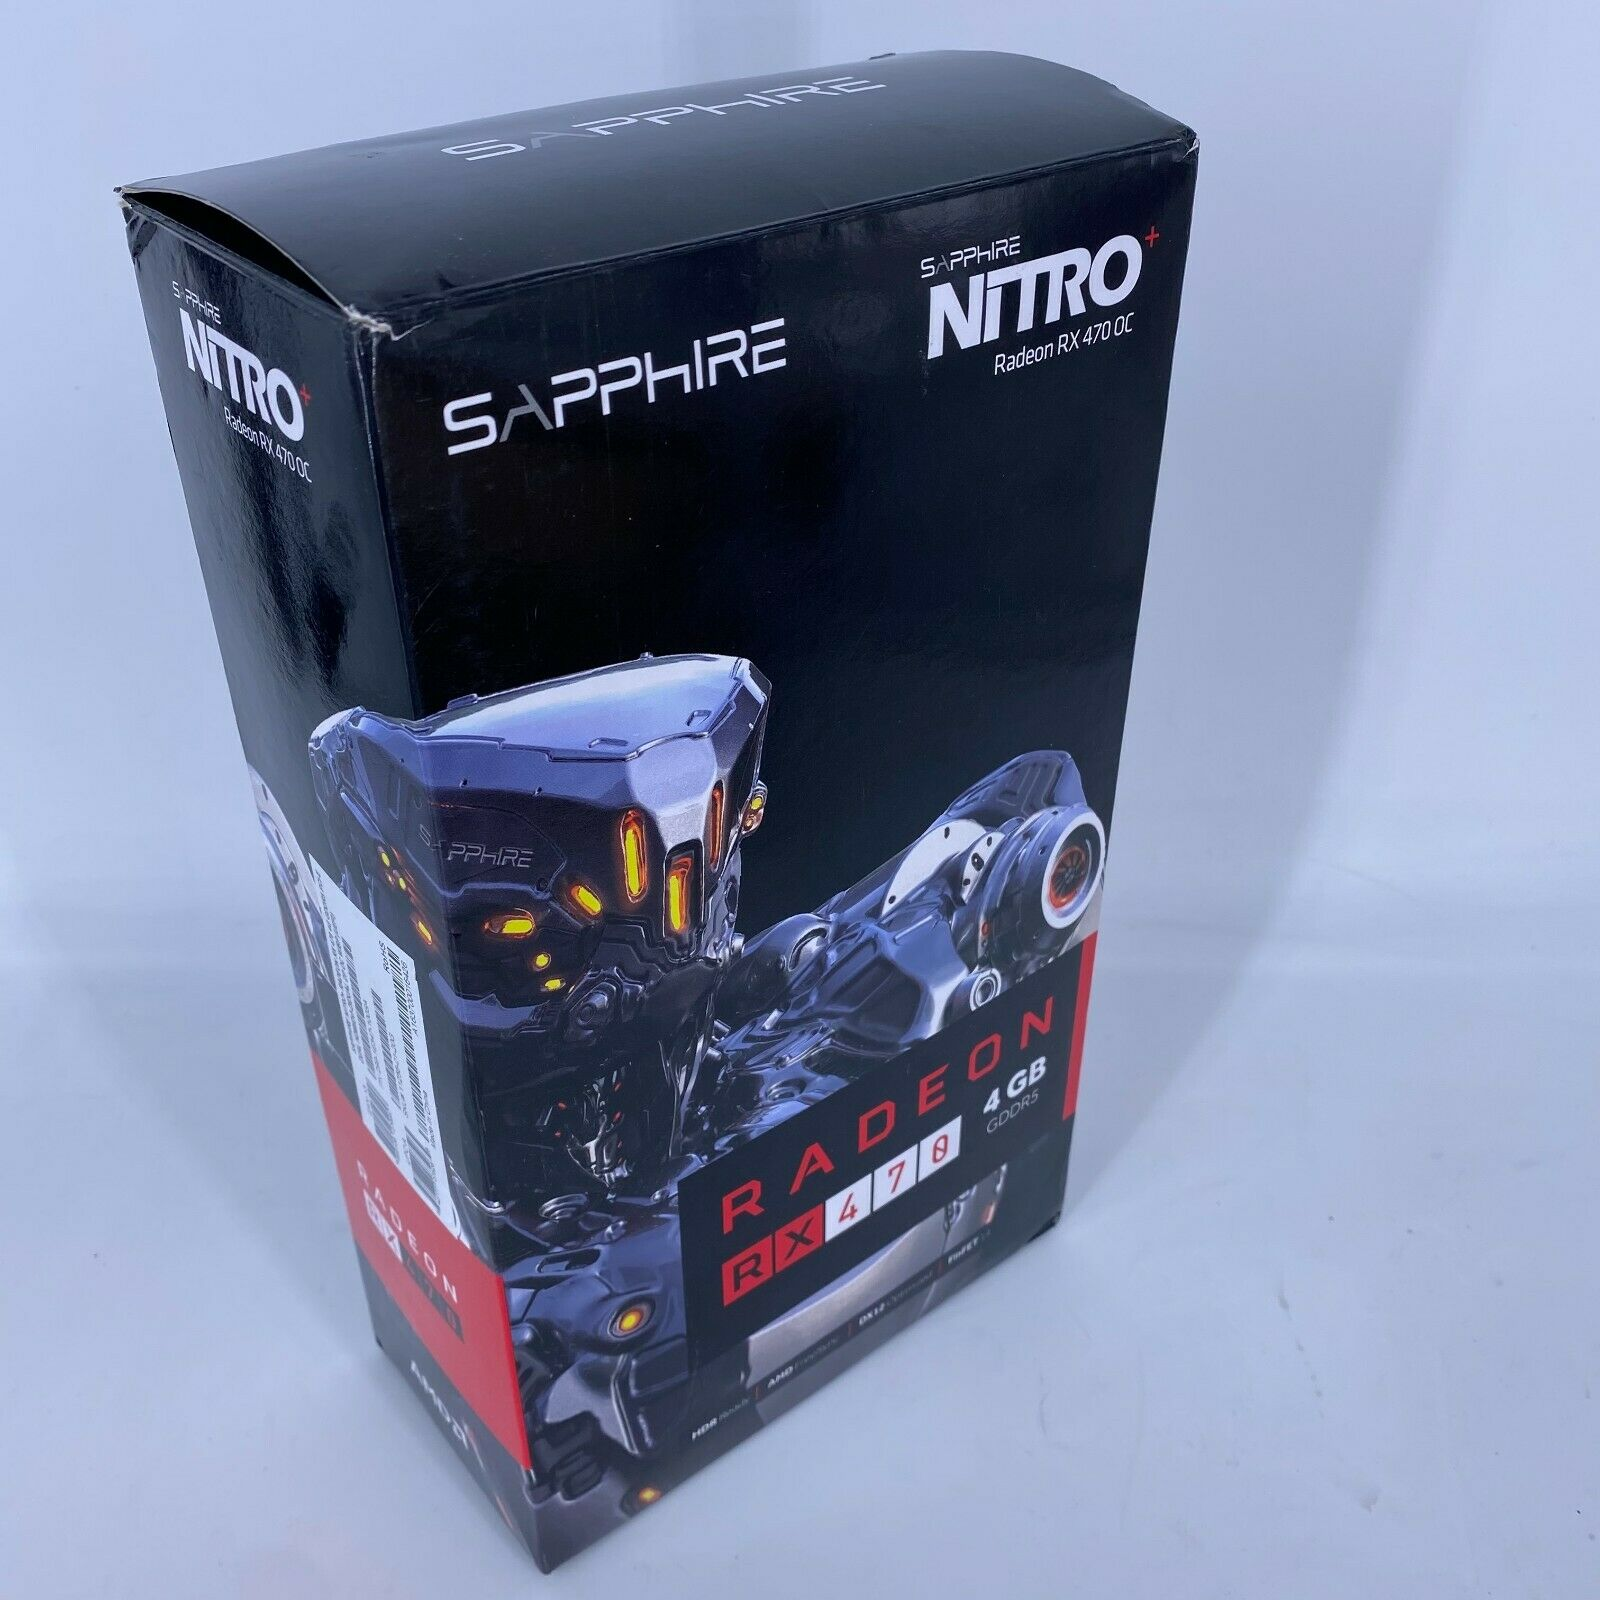 *EMPTY BOX* for - Sapphire RX470 RX 470 4Gb 4 GB Radeon * NO GPU *